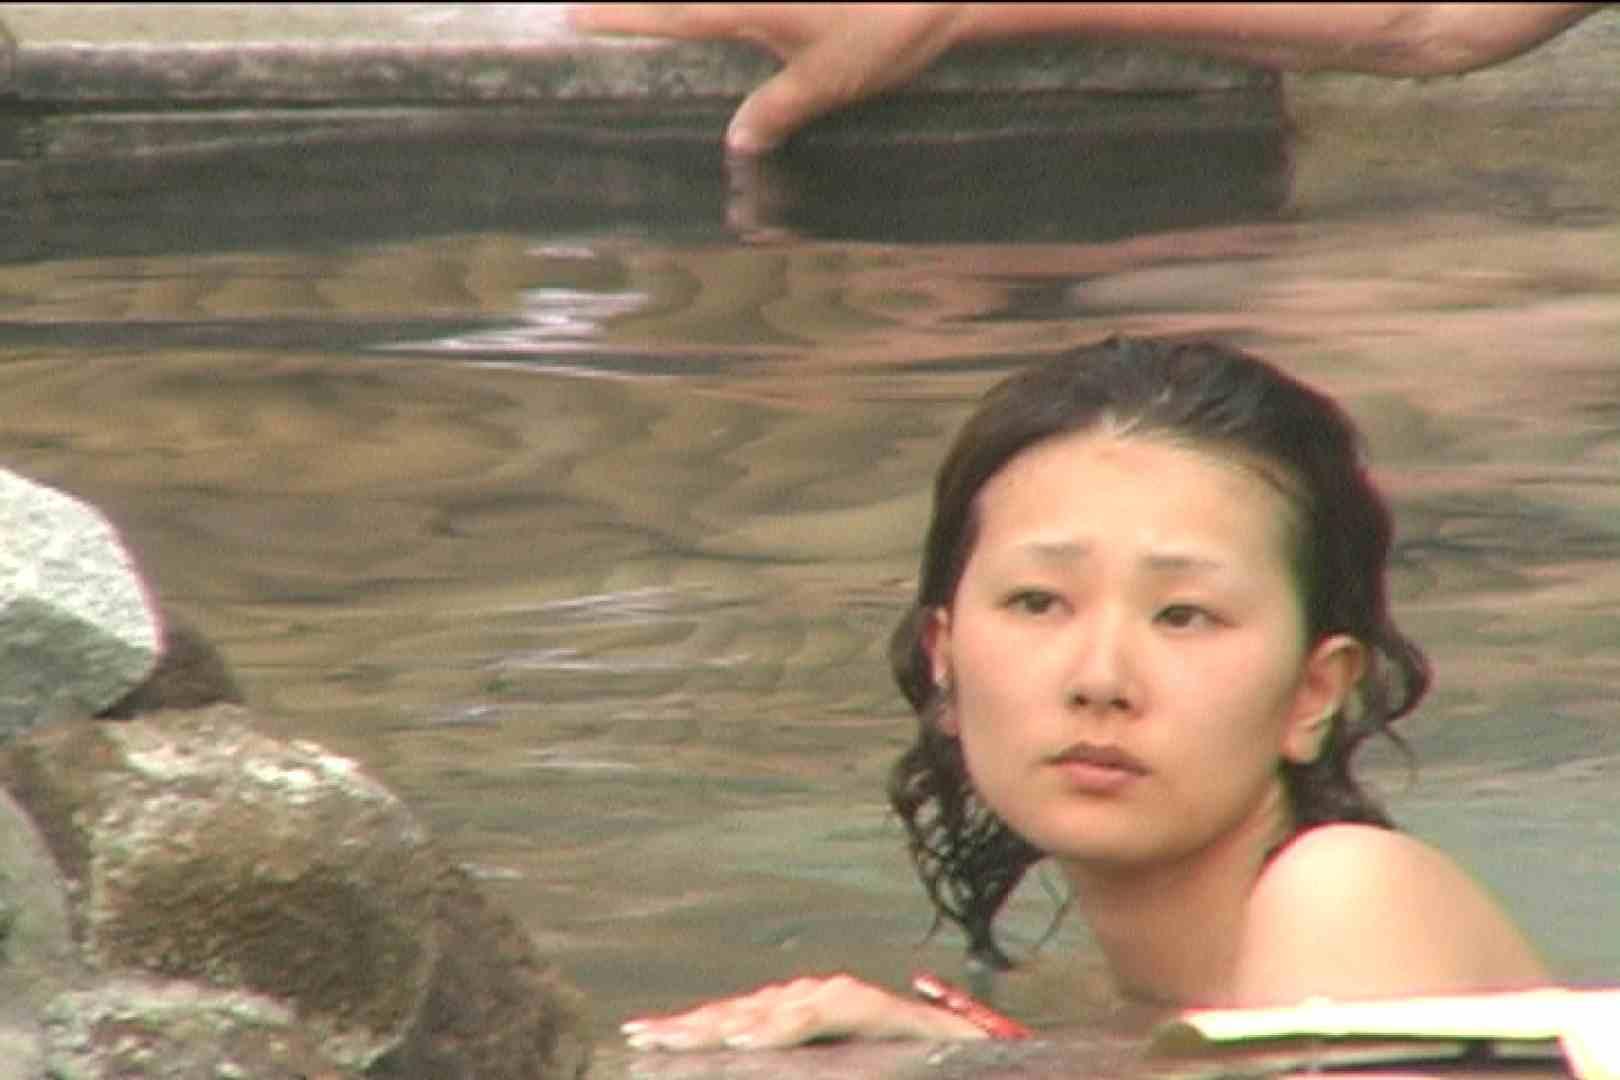 Aquaな露天風呂Vol.131 露天 | OL女体  82連発 1